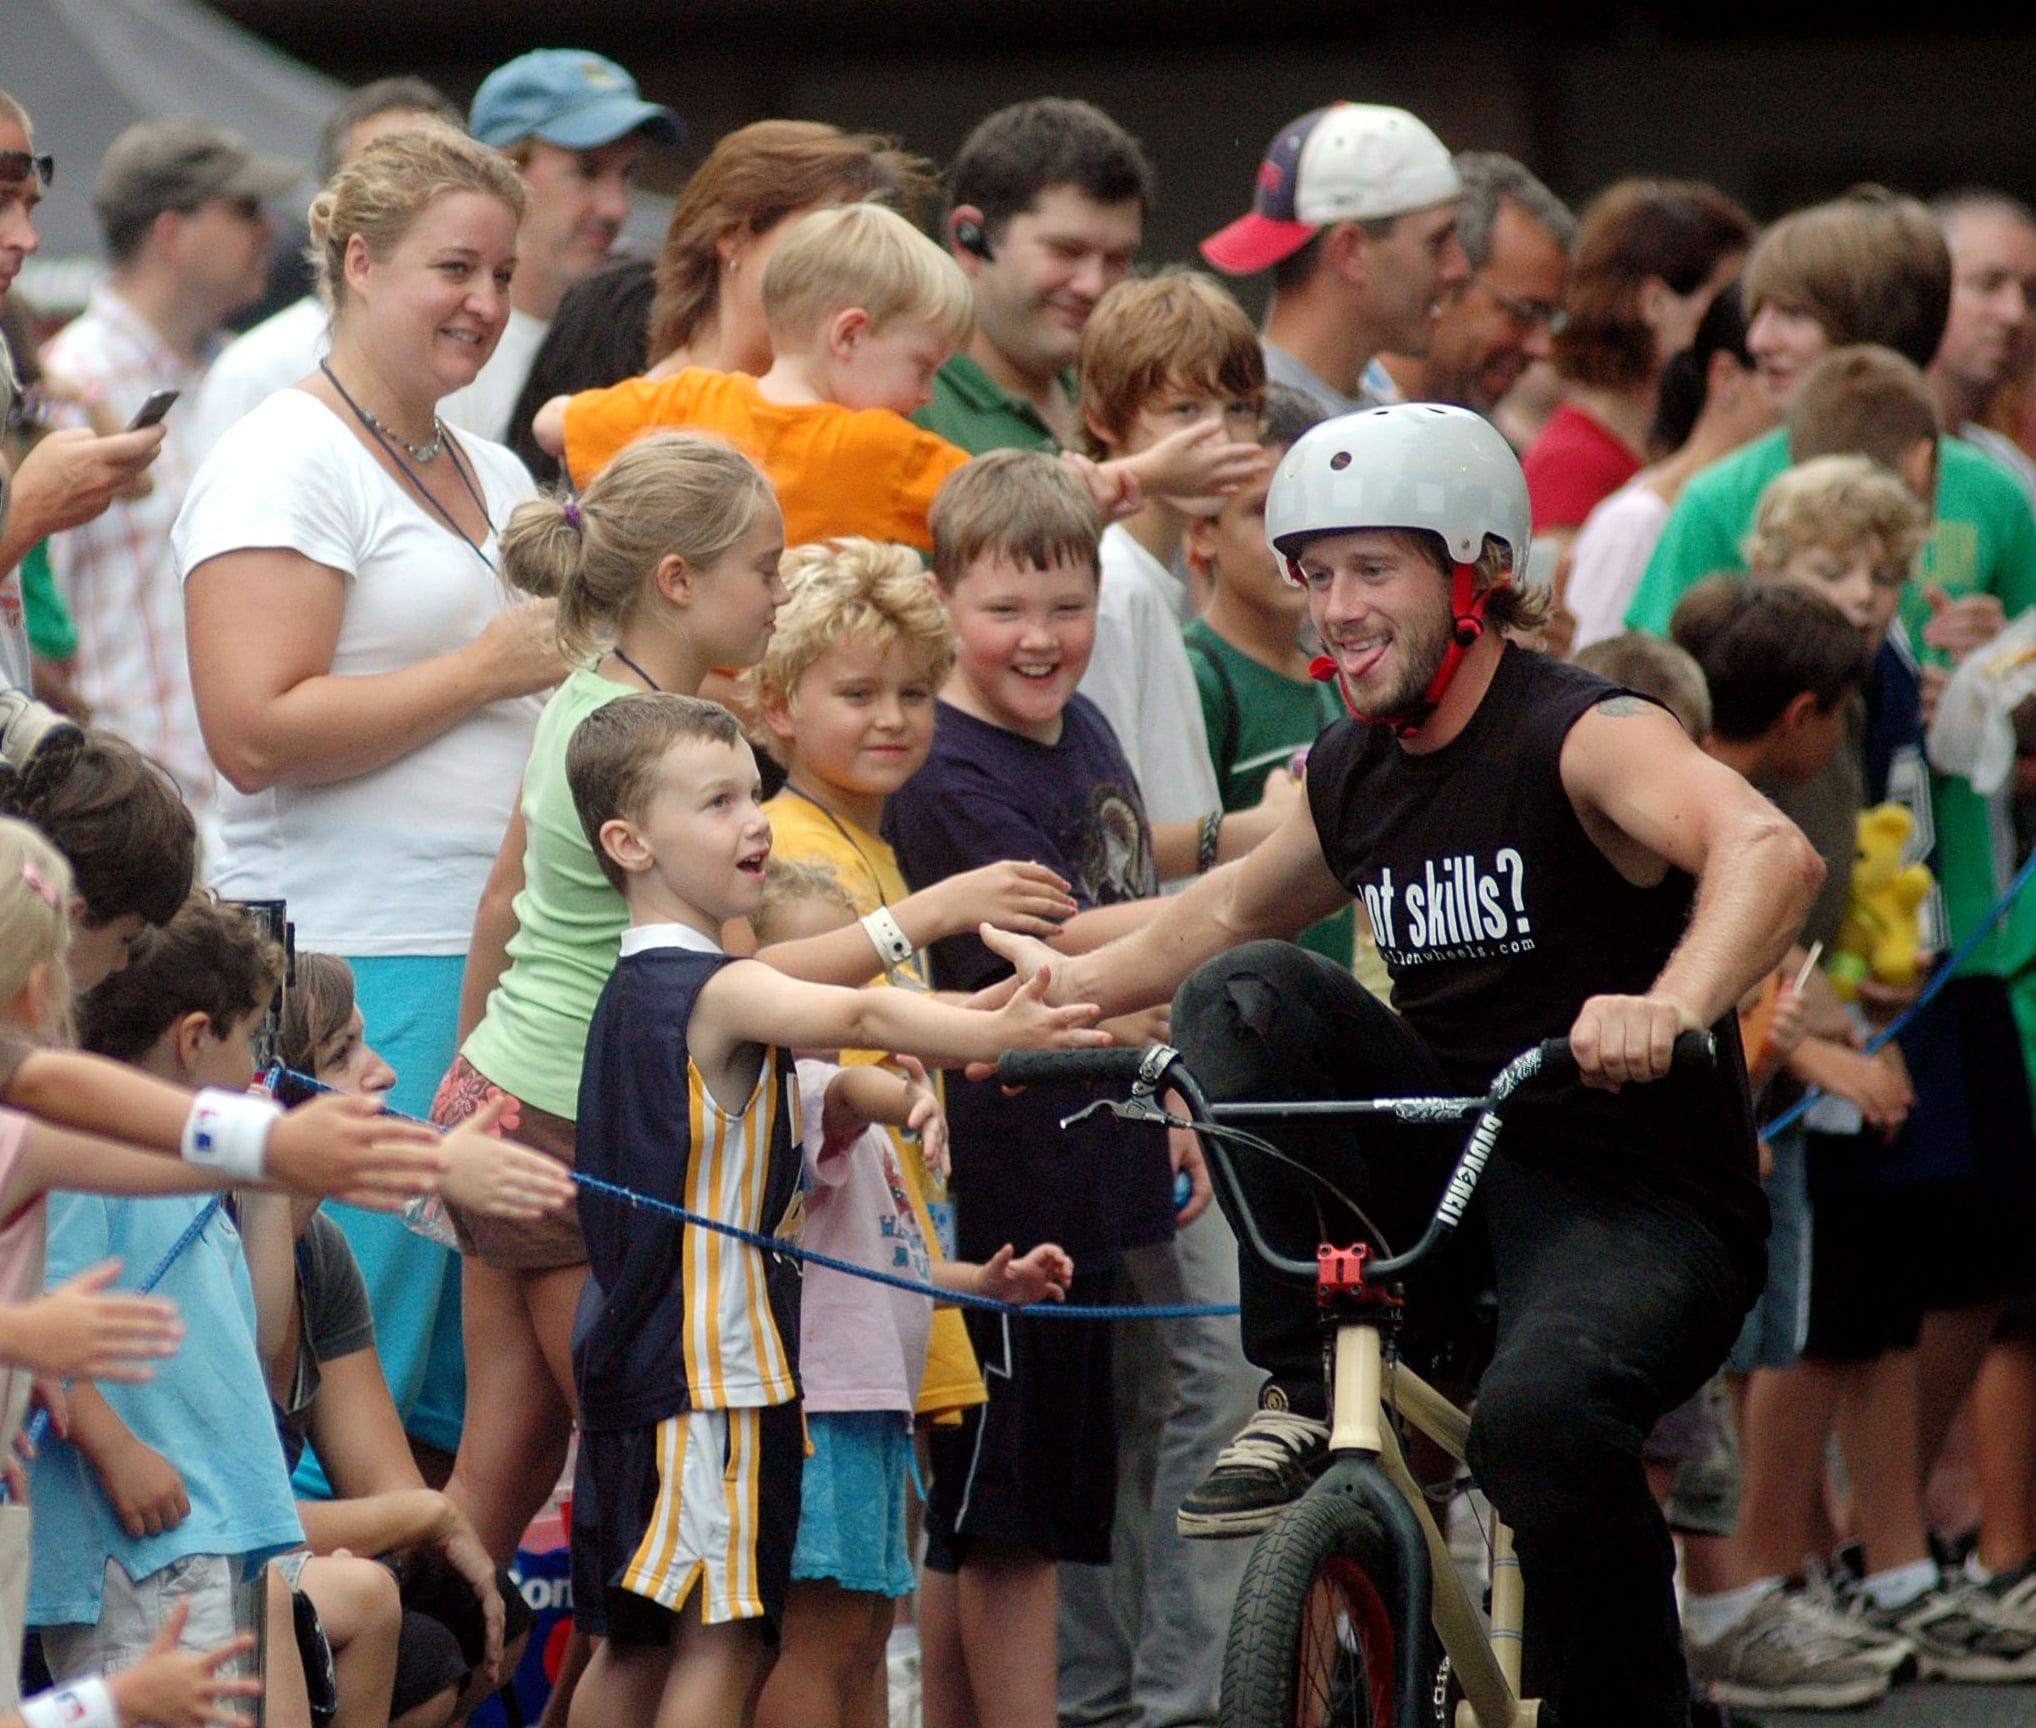 BMX biker with crowd.jpg